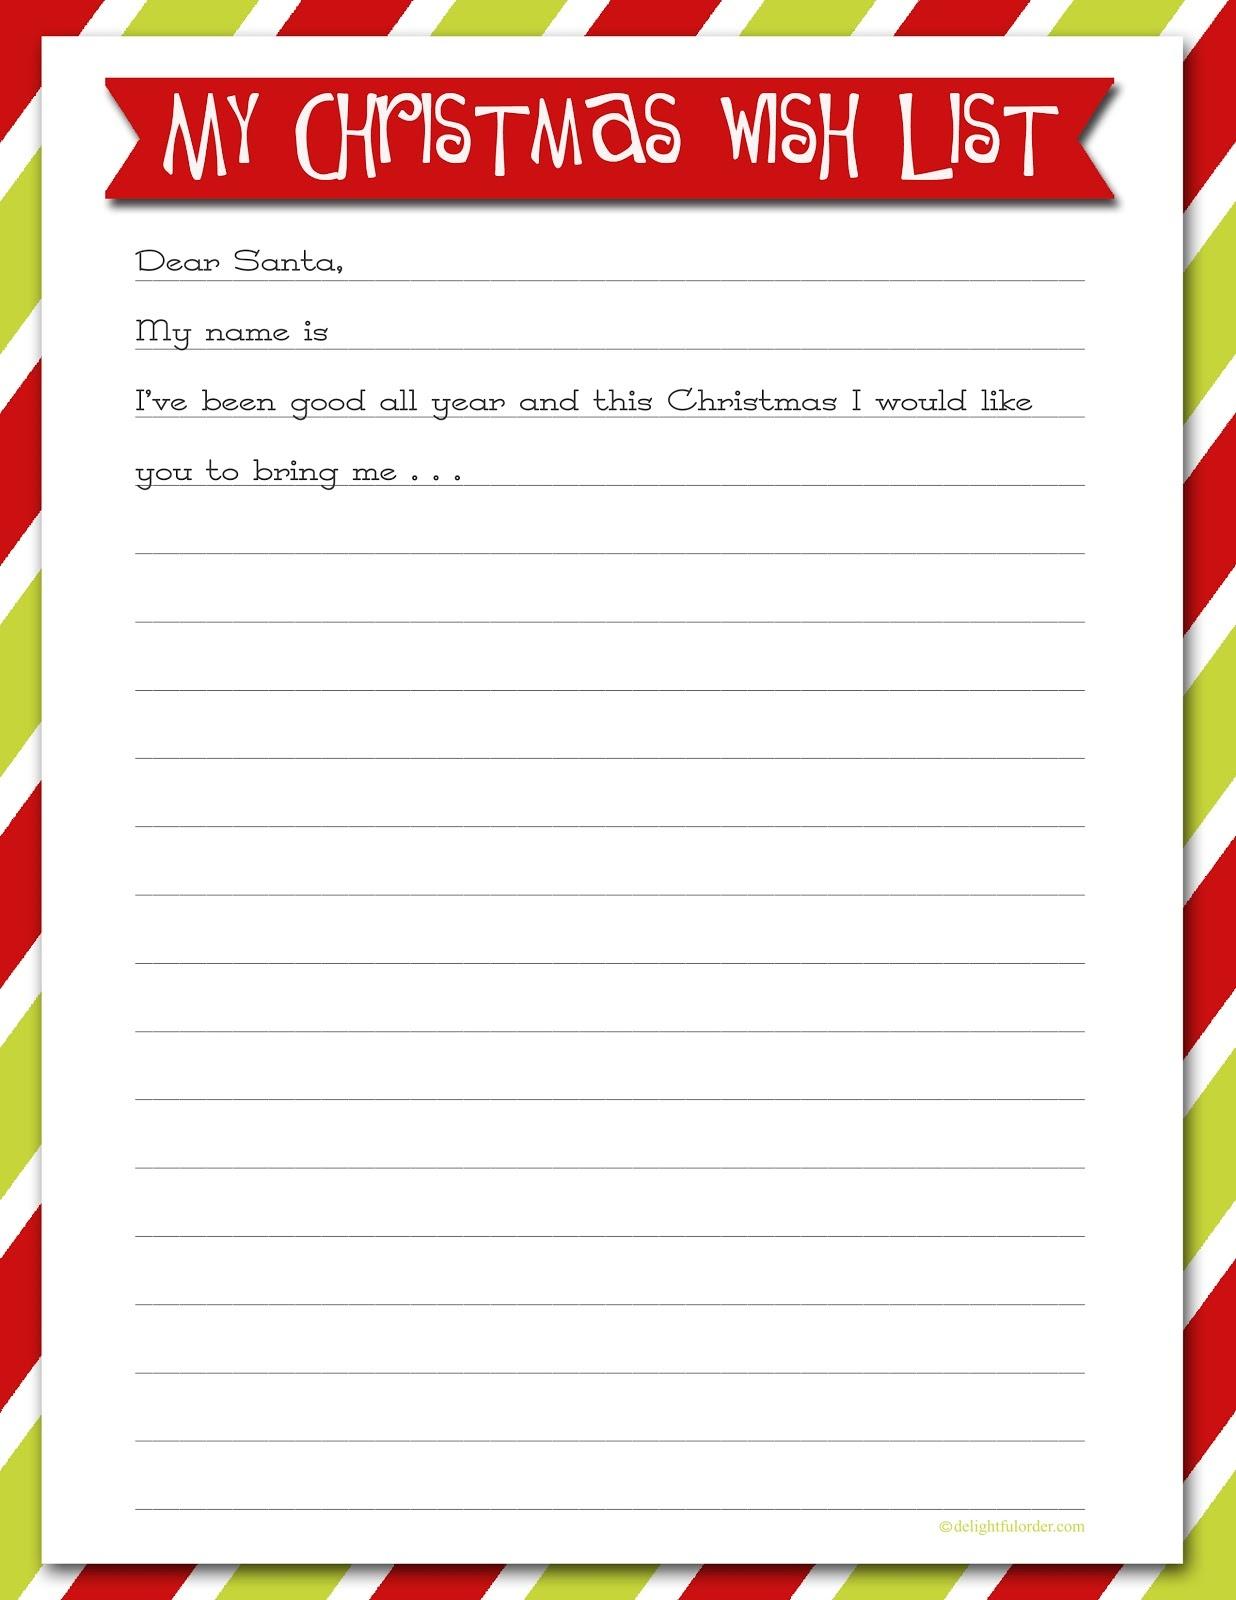 Delightful Order: Christmas Wish List - Free Printable - Free Printable Christmas List